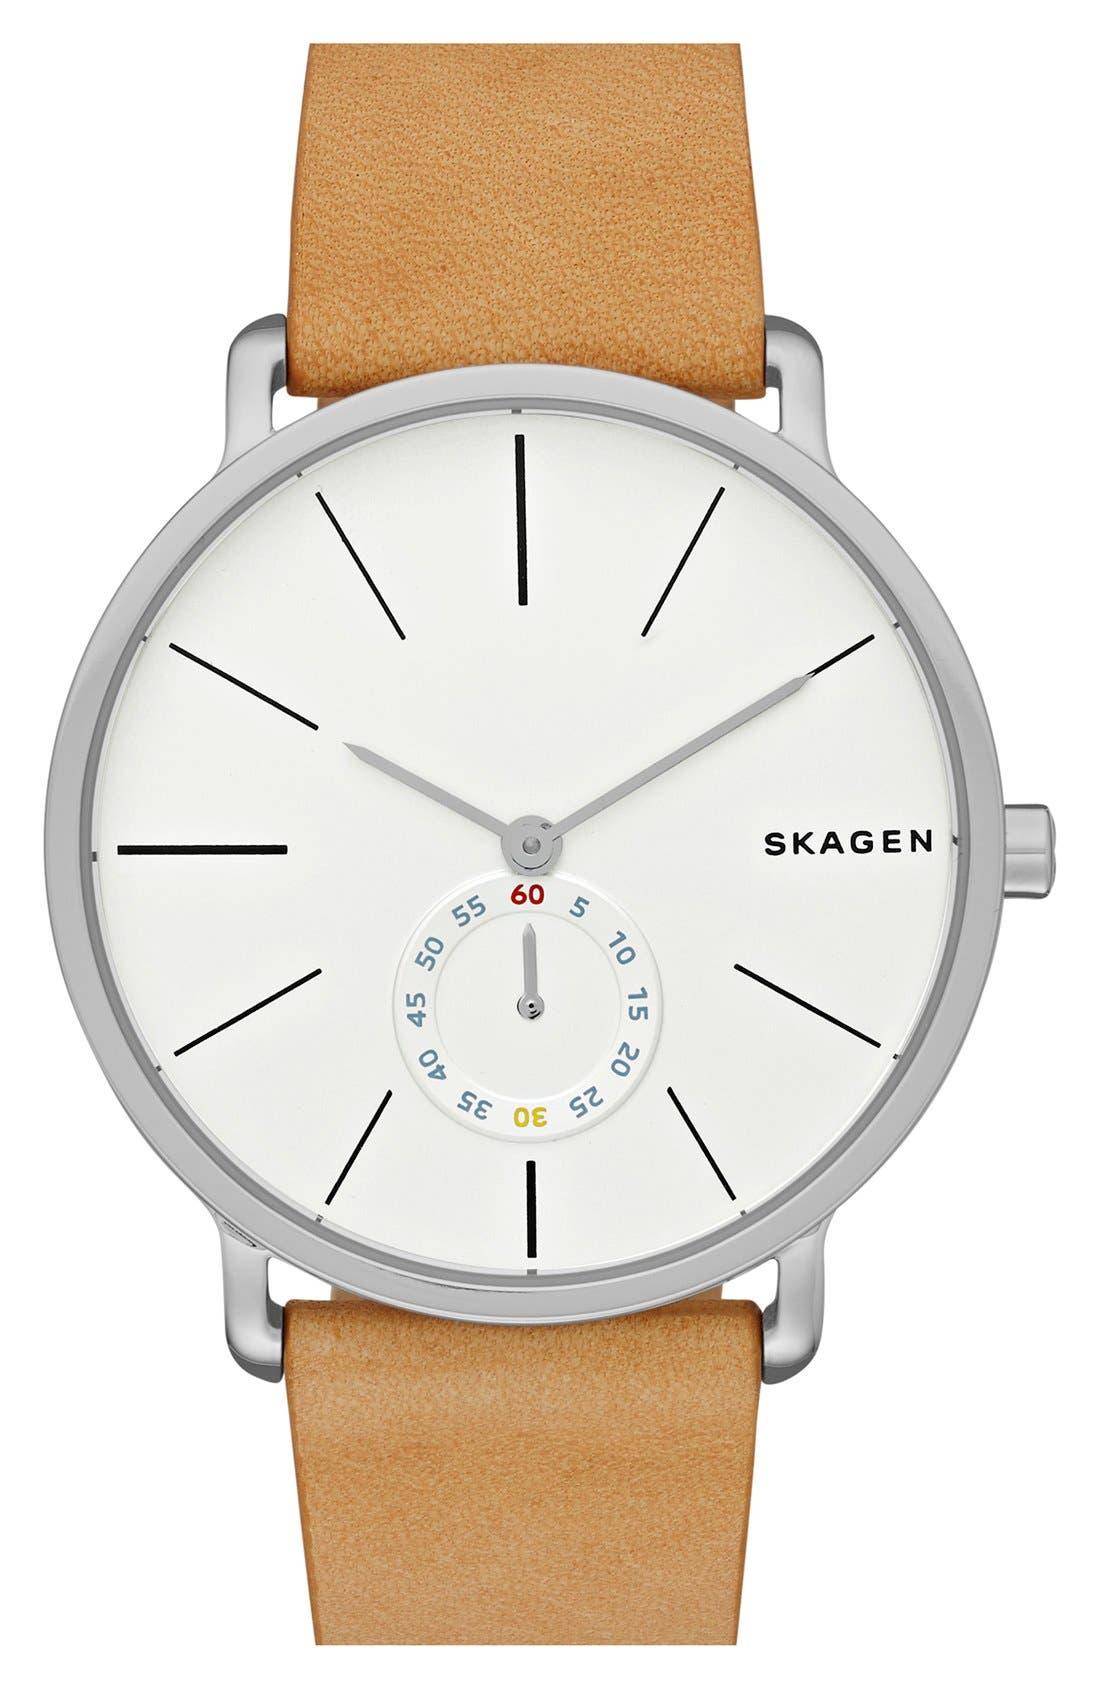 Main Image - Skagen Hagen Leather Strap Watch, 40mm